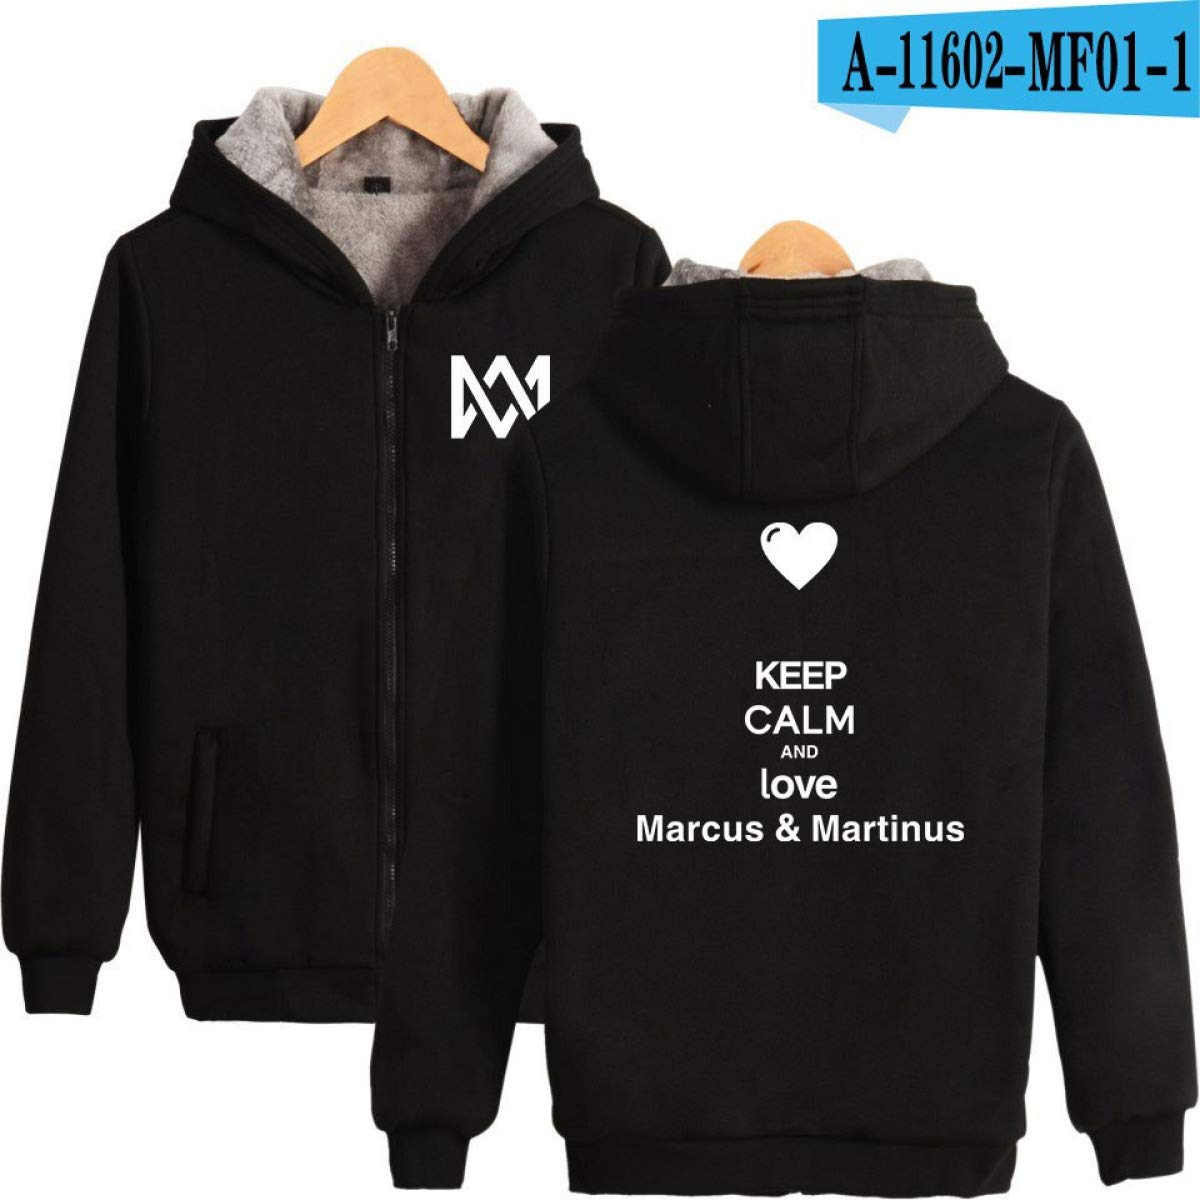 Amazon.com: WEEKEND SHOP Marcus and Martinus Weatshirt Women Coat Women Hoodies Zipper Jacket Warm Coat: Clothing